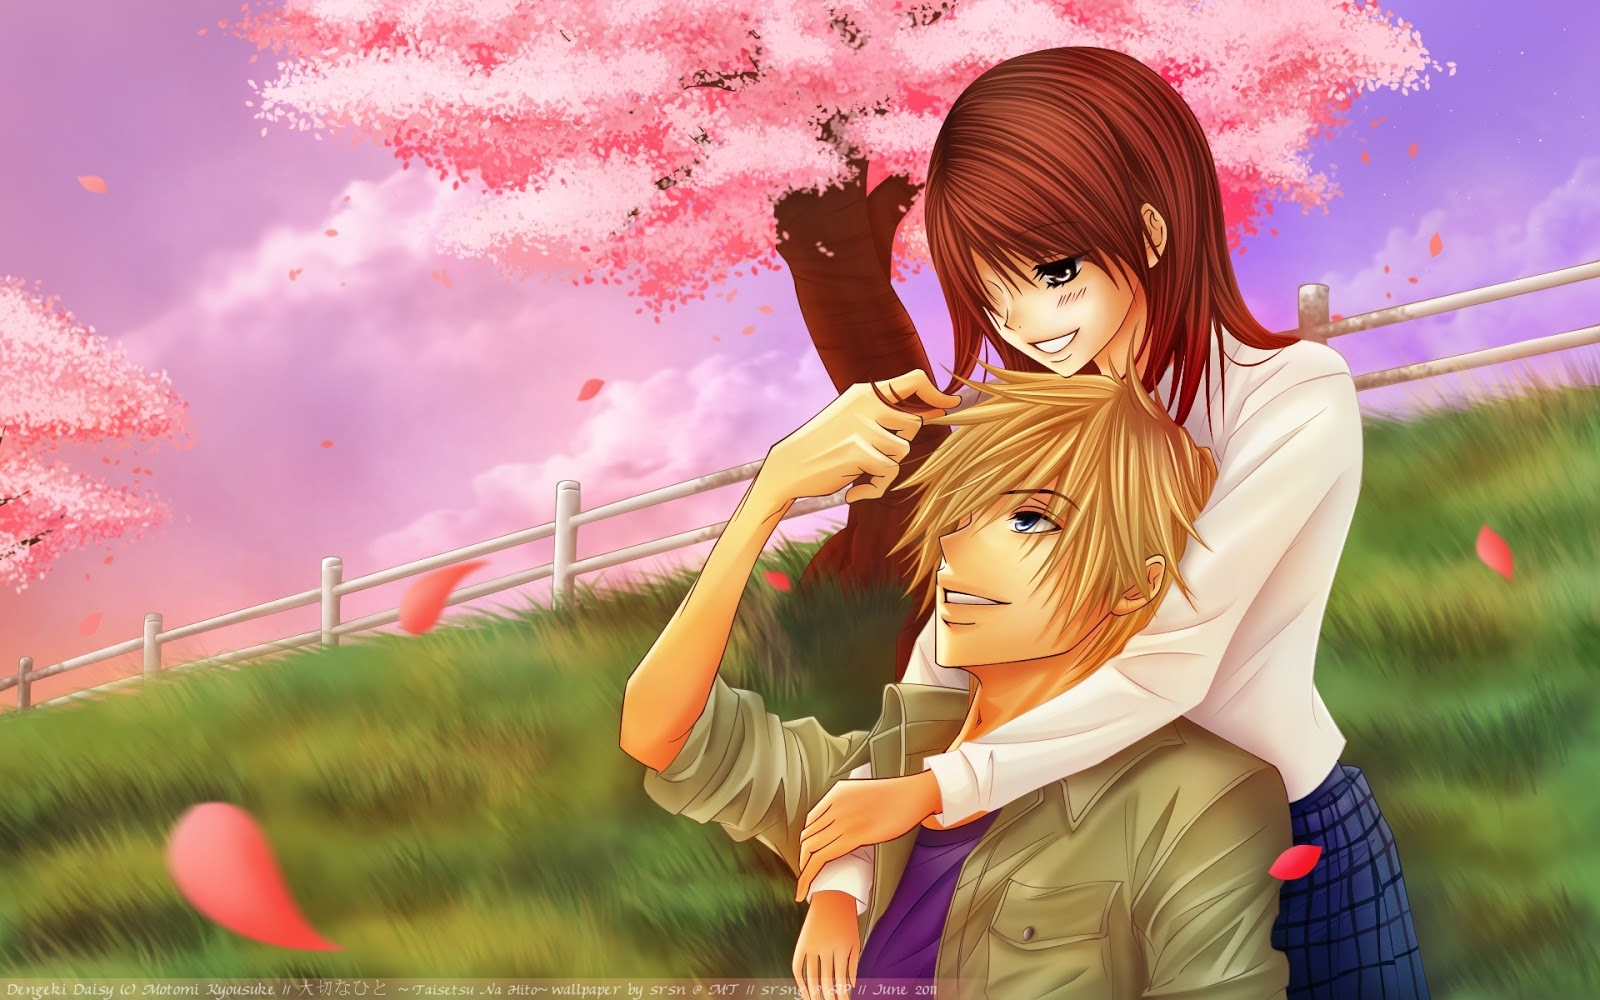 [SHOUJO manga] Dengeki Daisy Srsn_dengeki_daisy_kurosaki_tasuku_kurebayashi_teru_guy_girl_tenderness_smile_32267_1920x1200